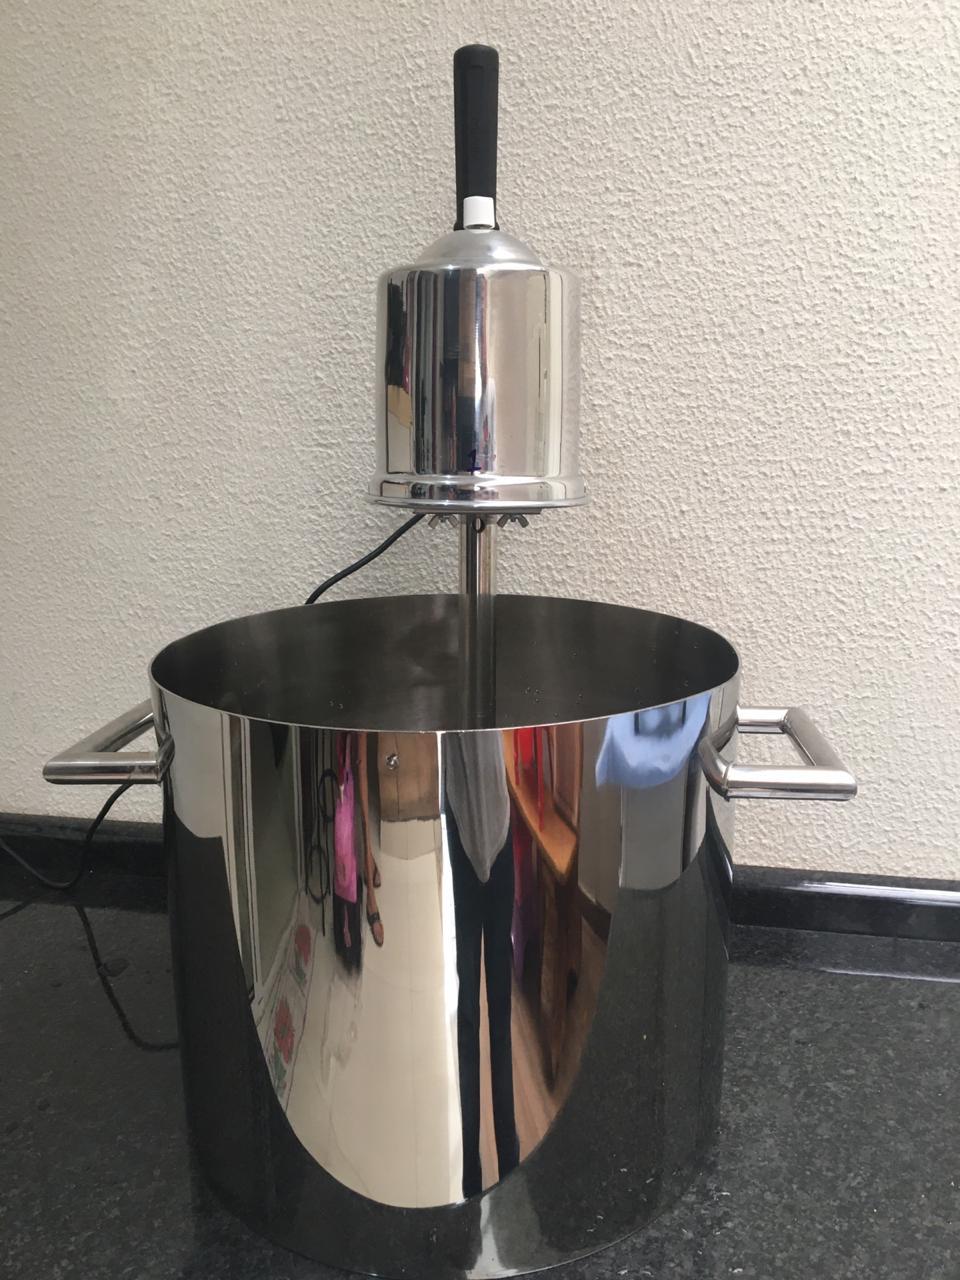 Super Mixer Industrial Controlpot Sd 3018 .1800 Watts  - controlpot Maquinas e Batedores Milk Shake